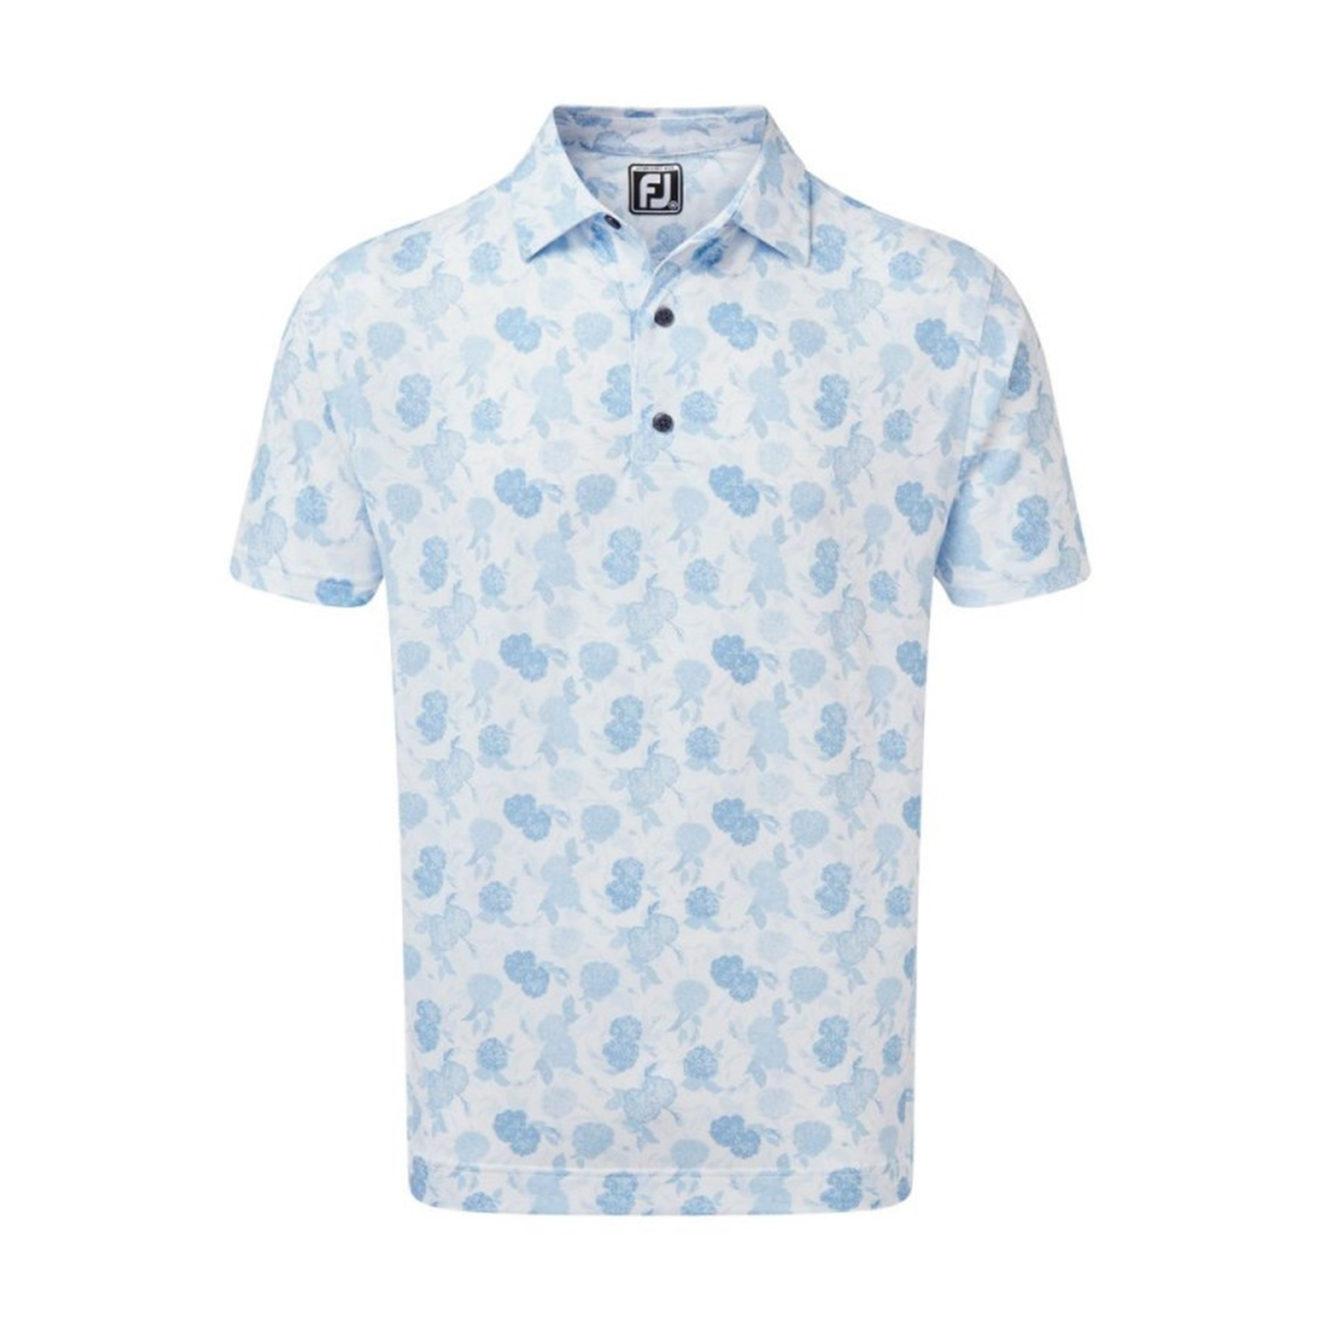 polo-footjoy-impression-floral-blancbleu